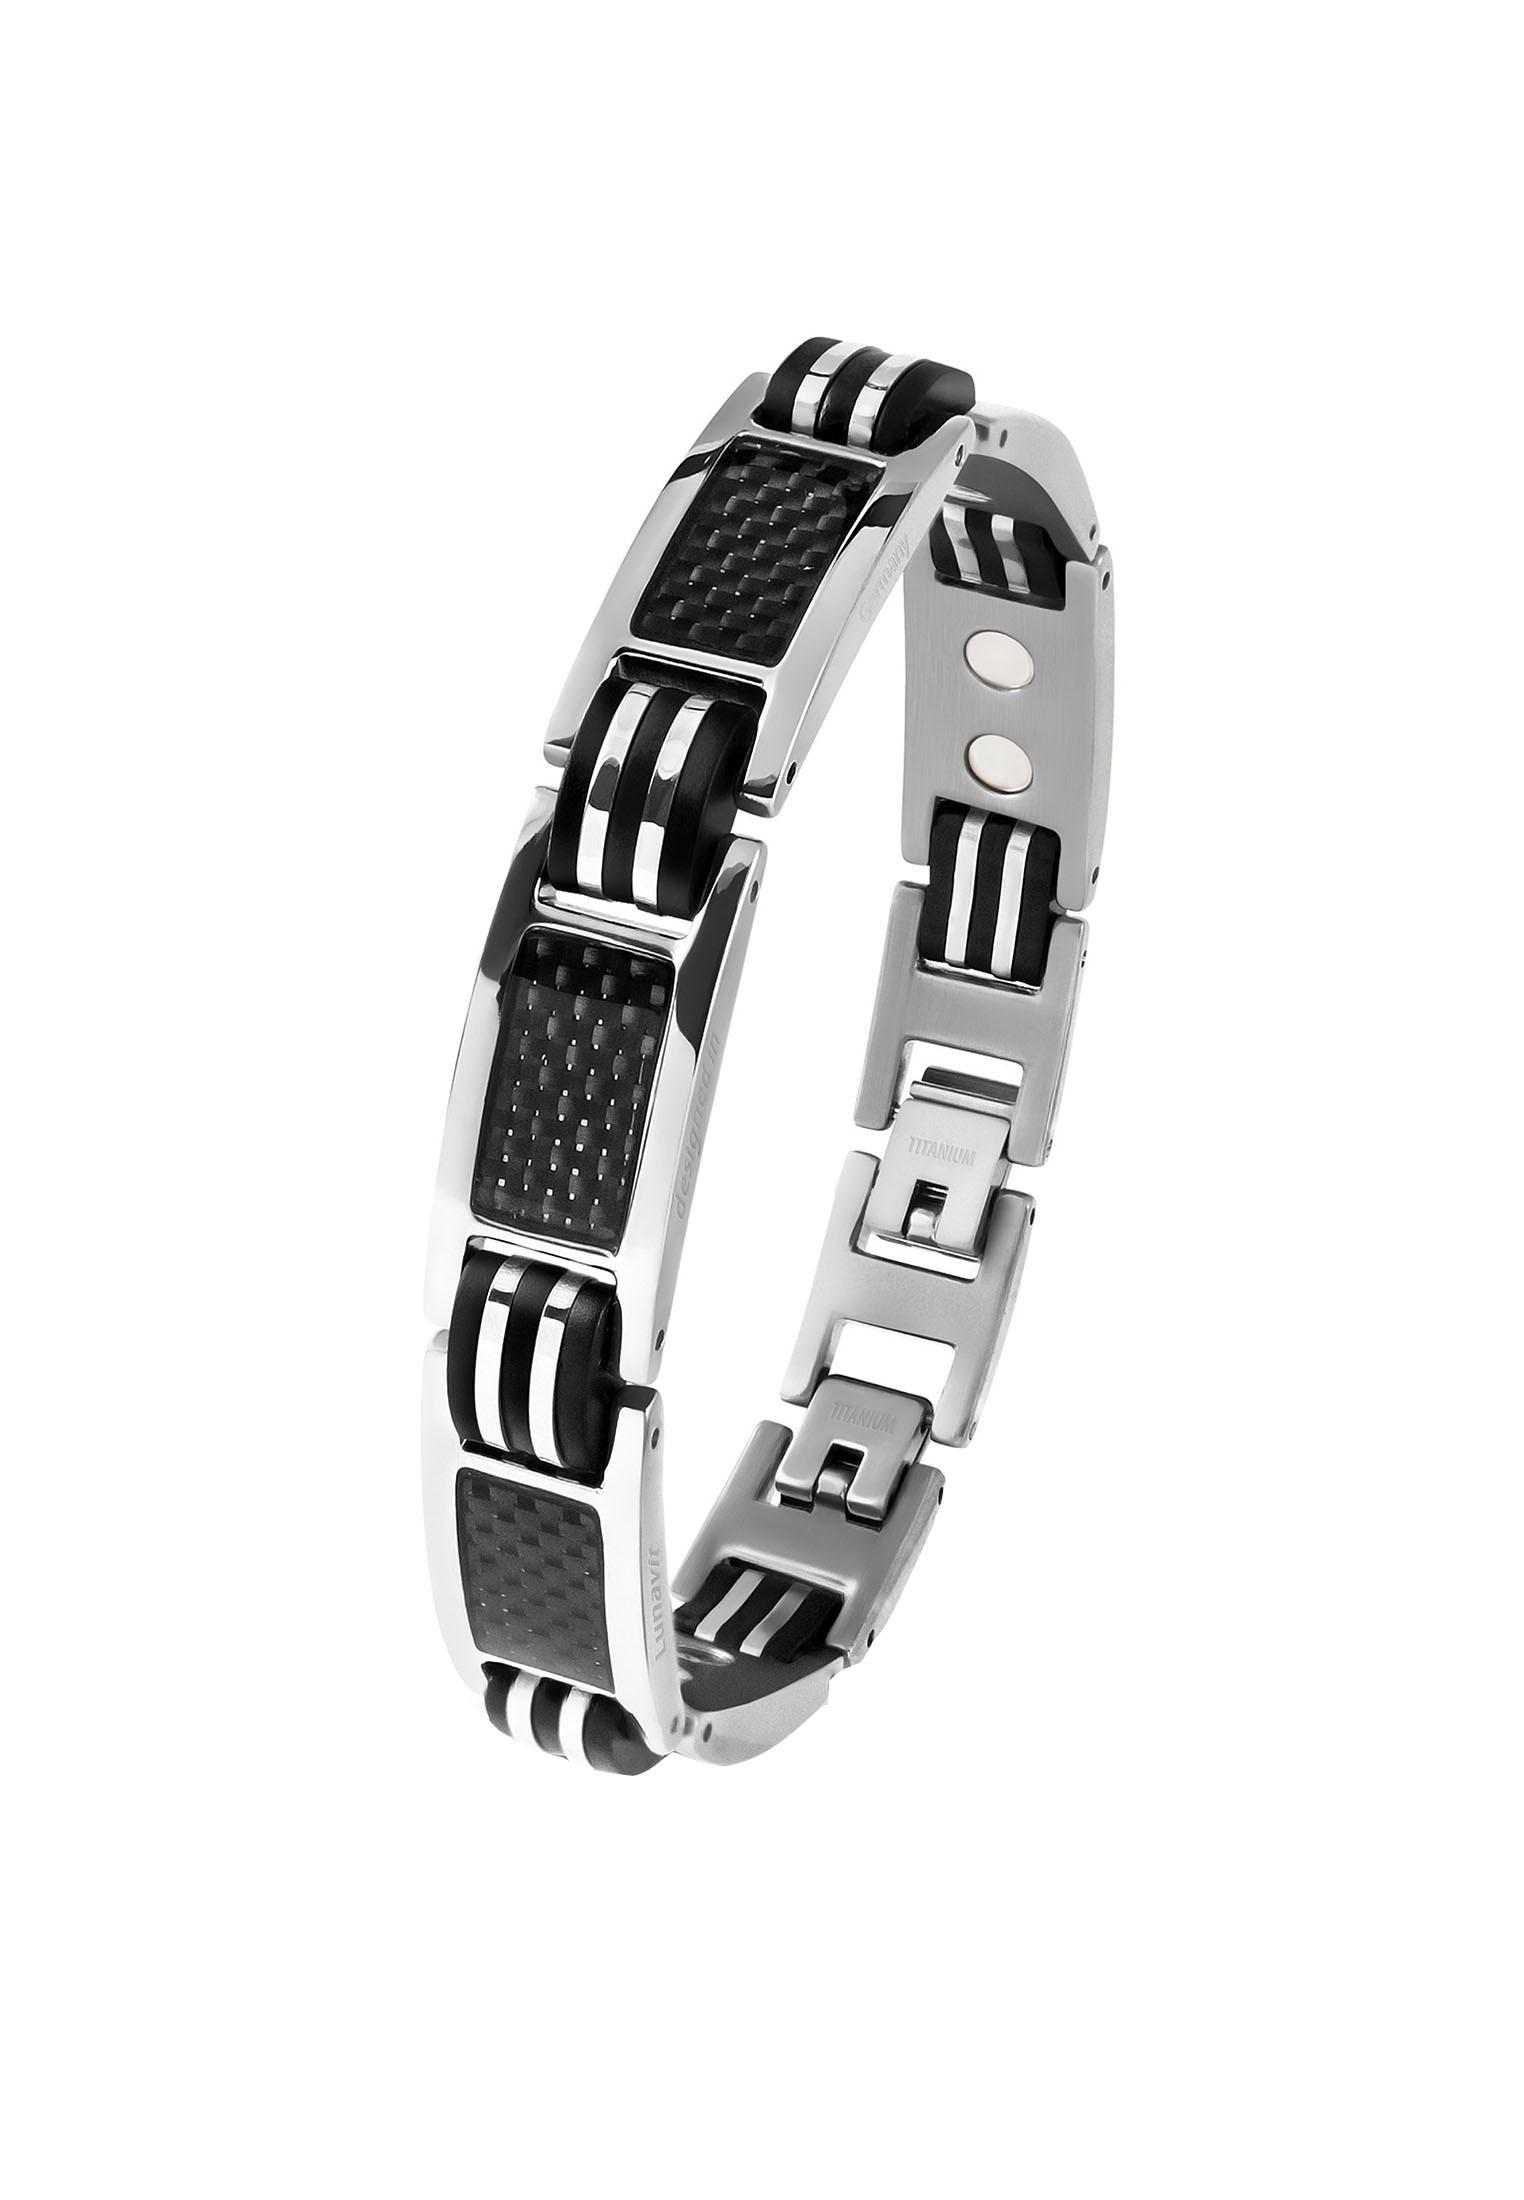 Lunavit Gliederarmband Magnet Titanarmband Ercole, Silber | Schmuck > Armbänder > Gliederarmbänder | Lunavit